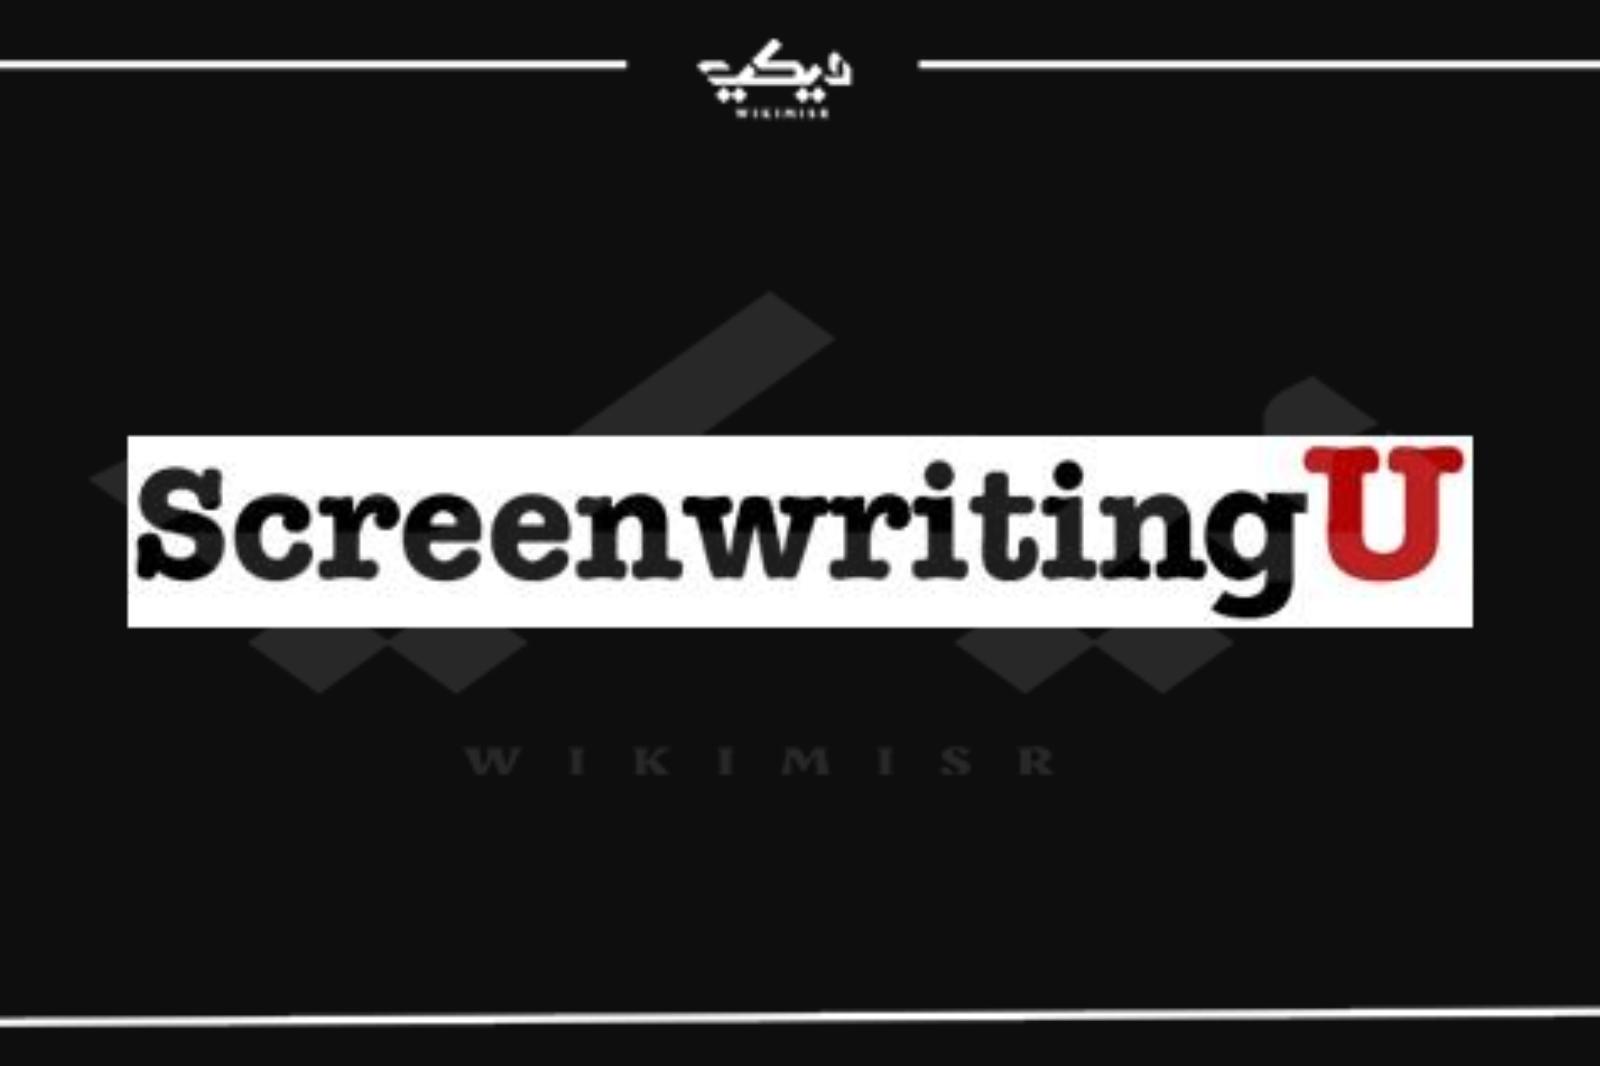 Screenwriting U